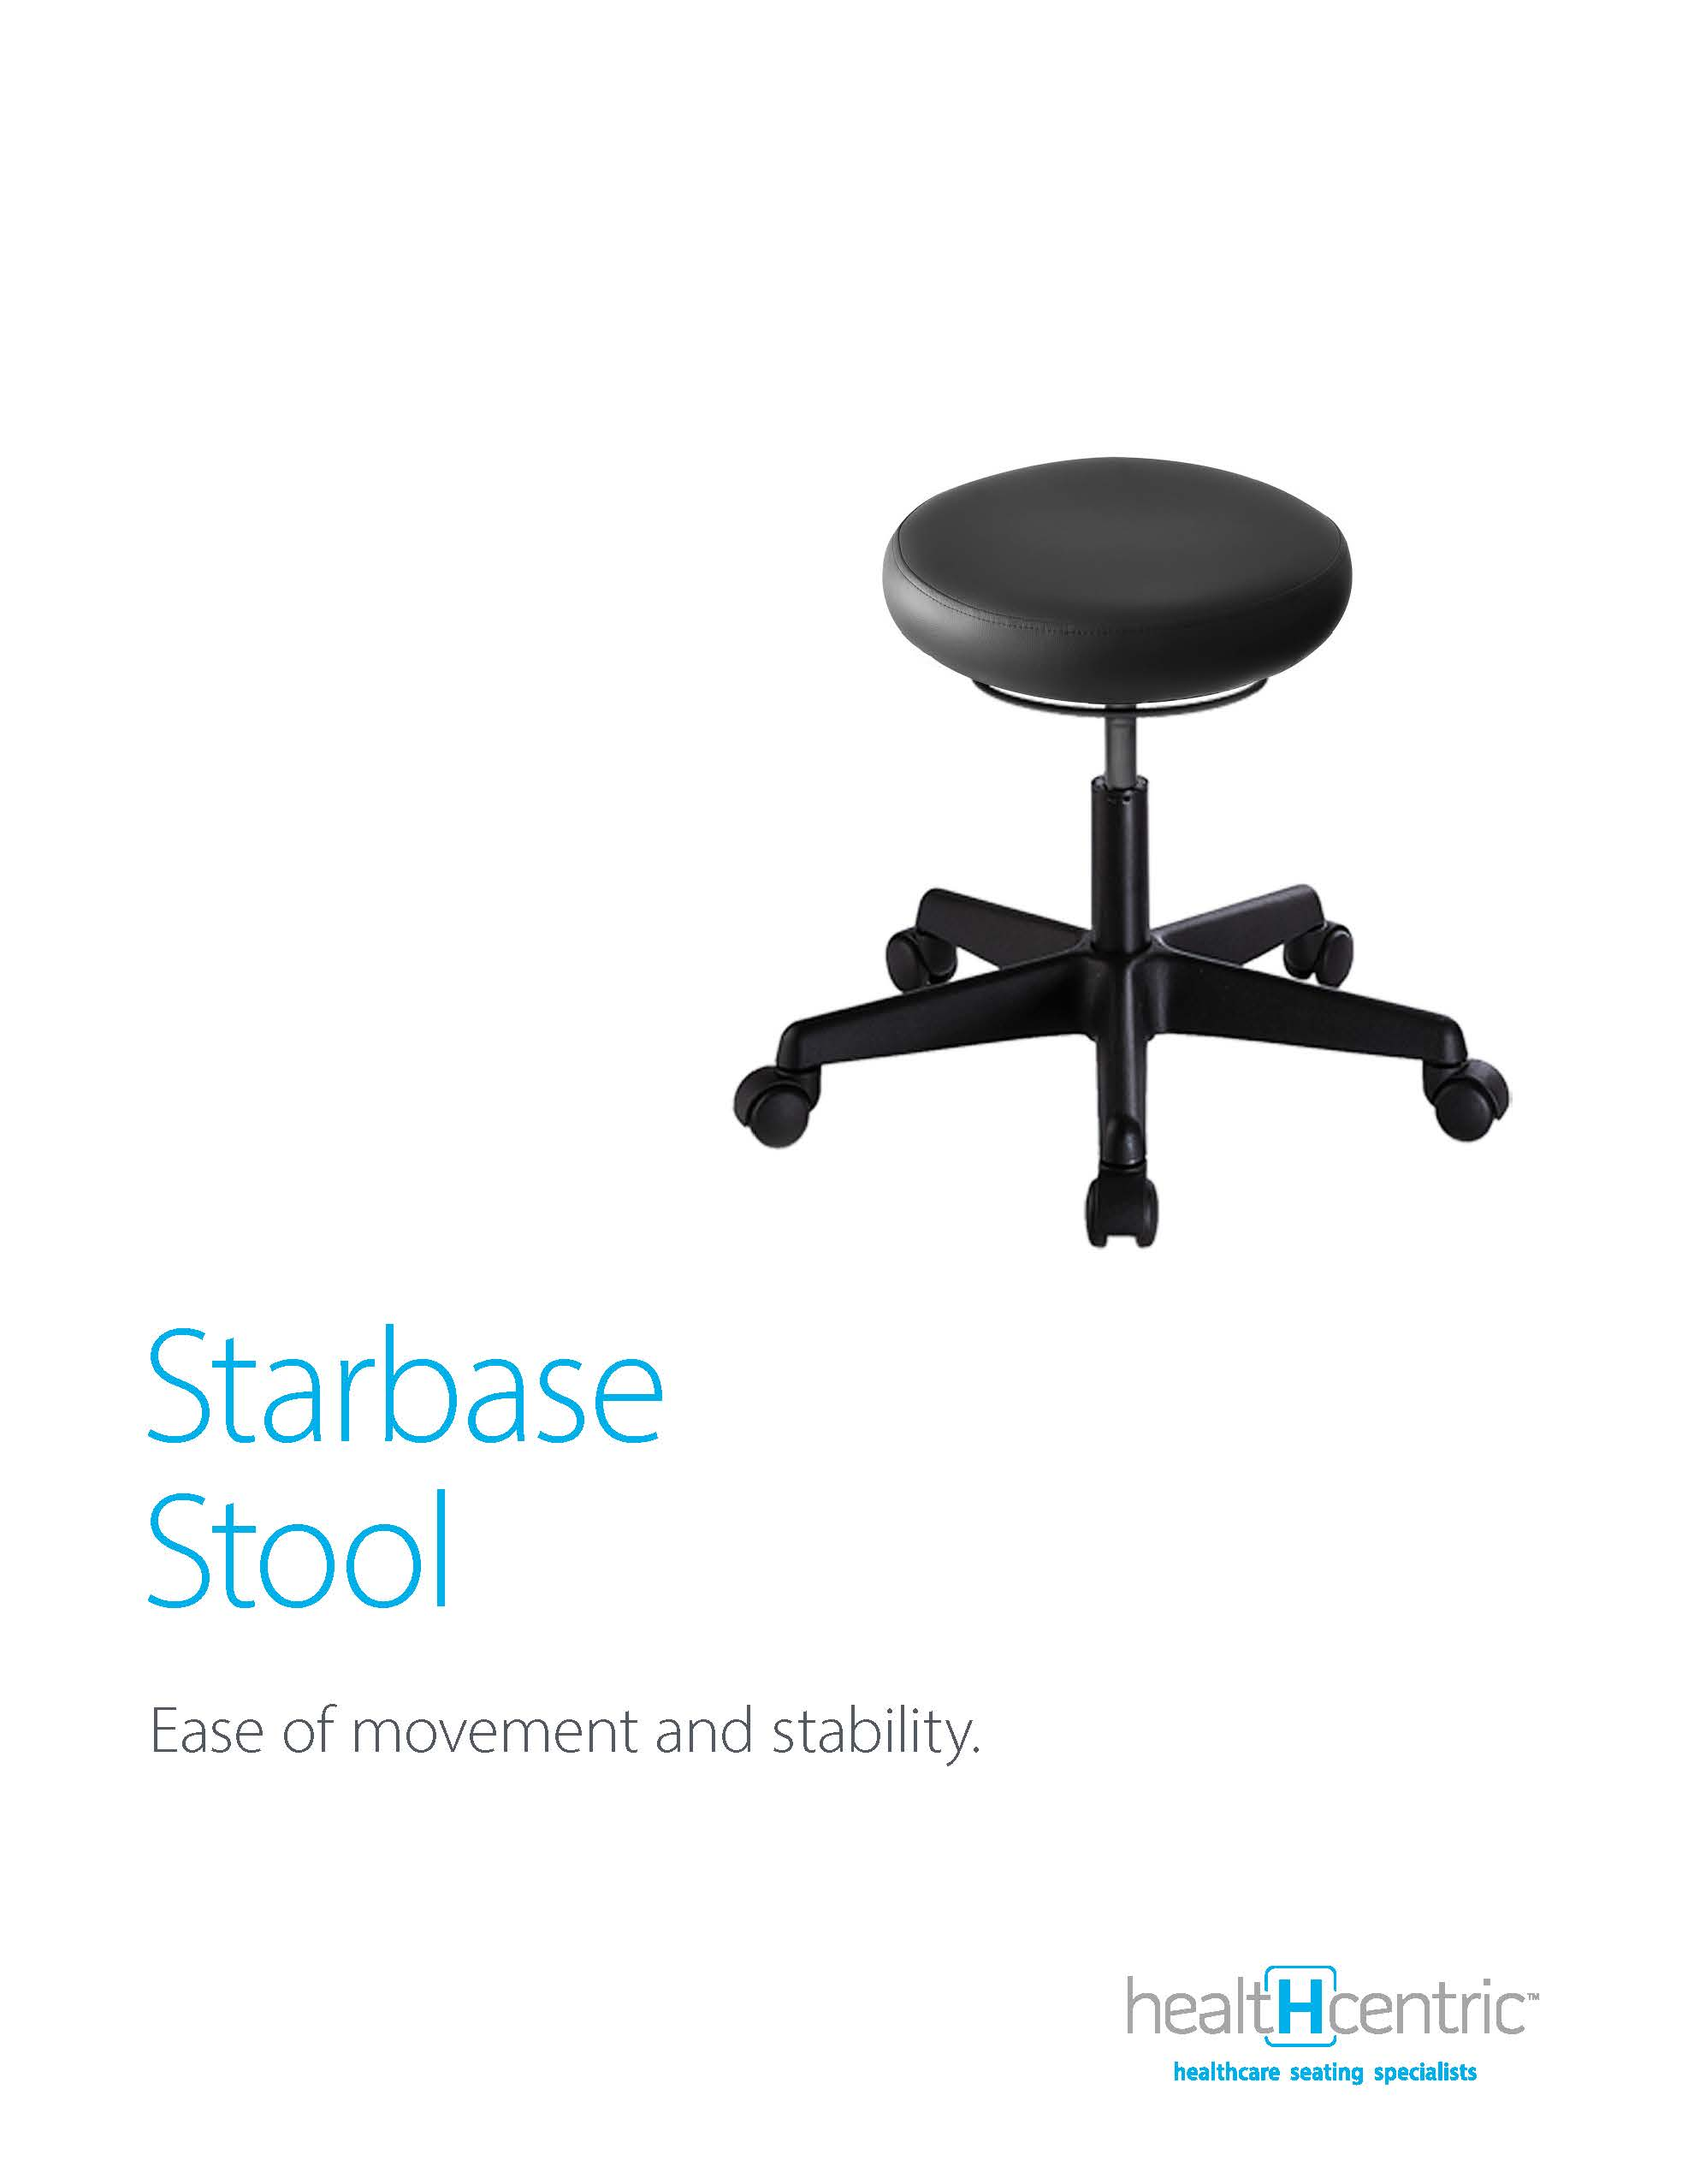 Starbase Stool